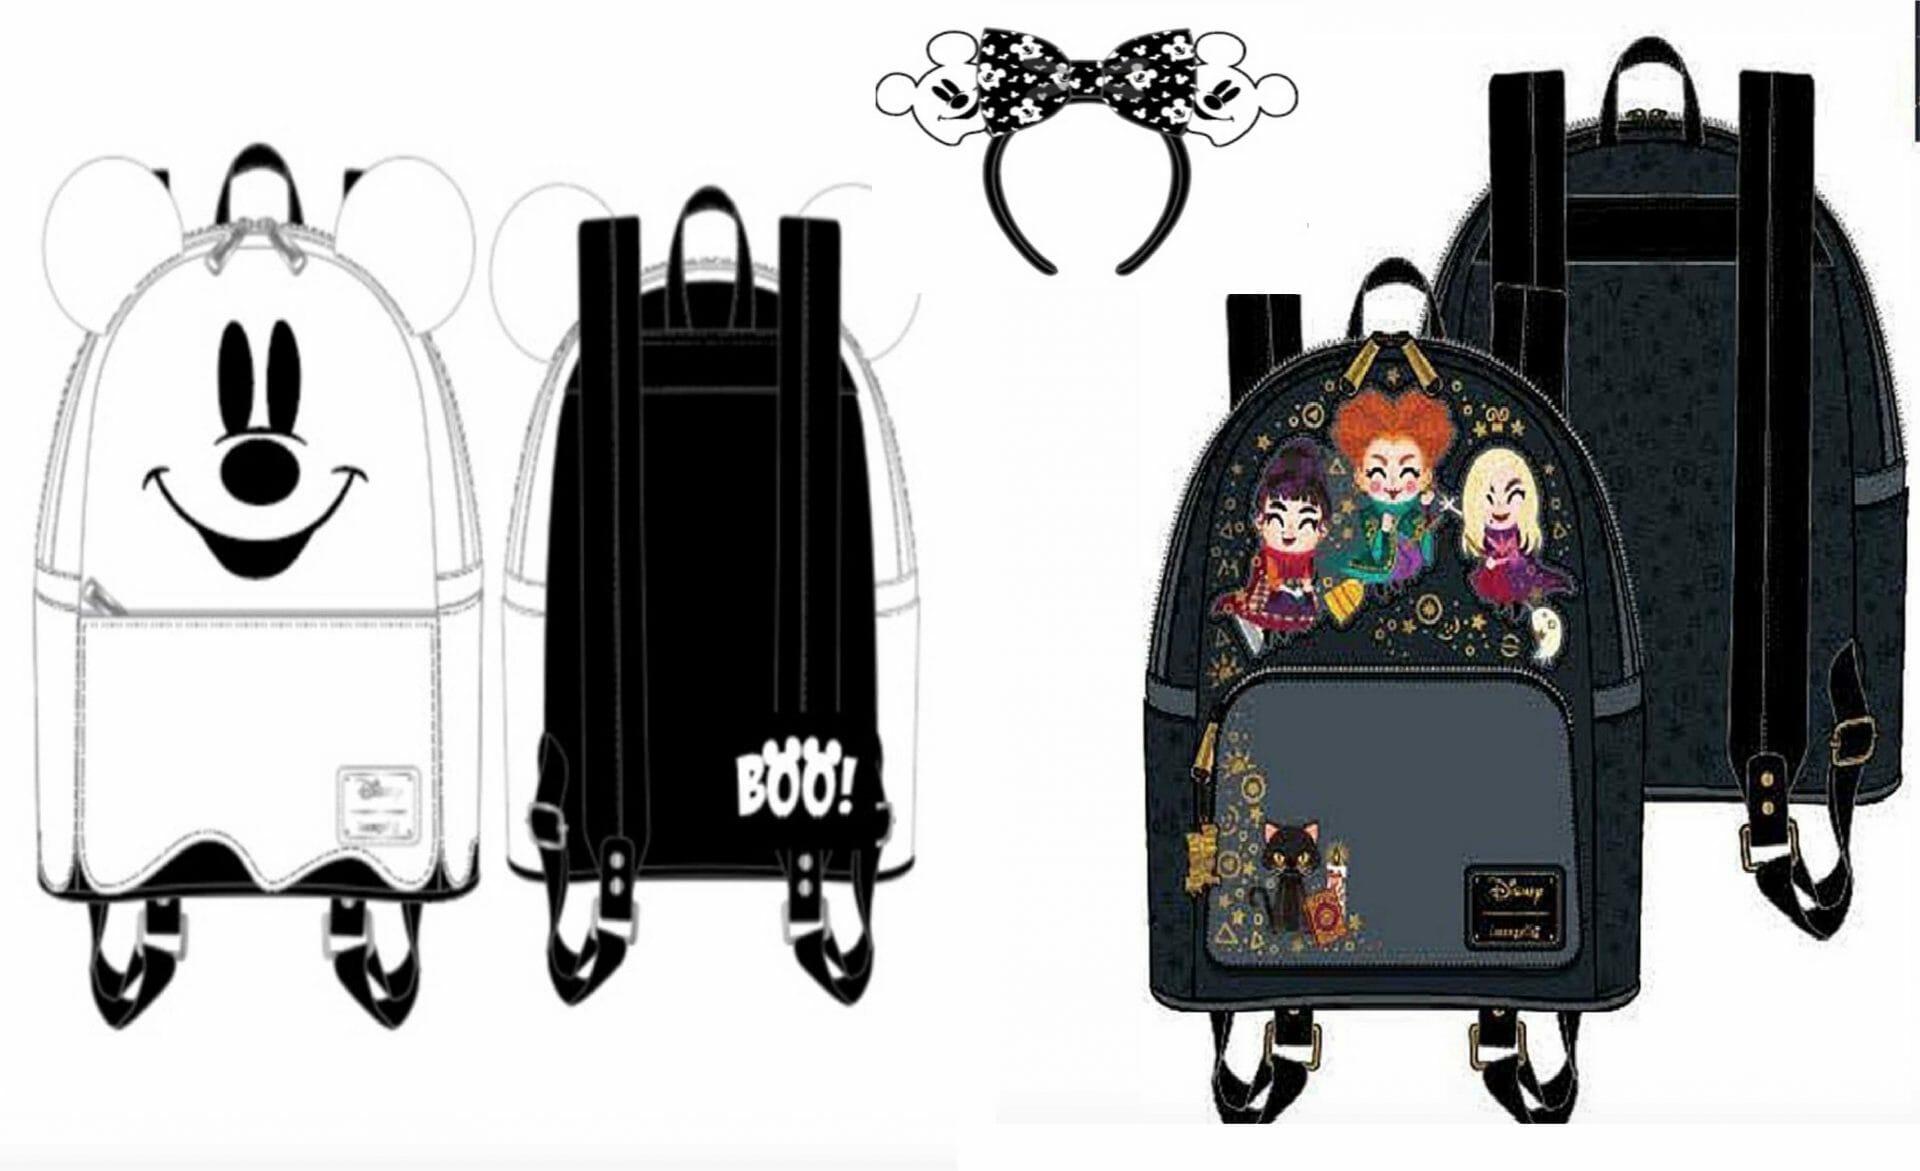 New Loungefly Disney Halloween Merchandise Sneak Peek!